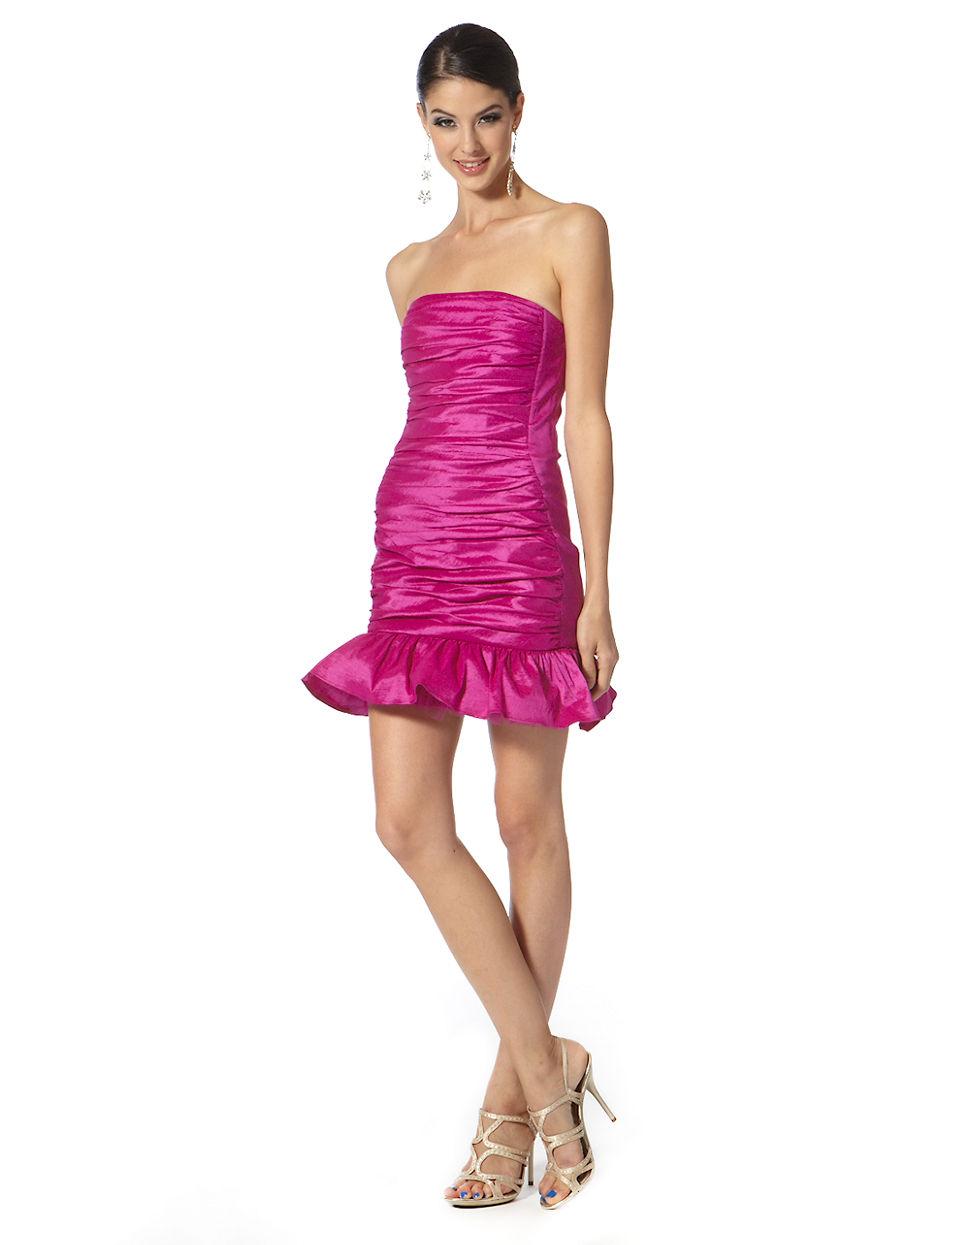 Excepcional Vestidos De Baile De Jessica Mcclintock Ideas ...